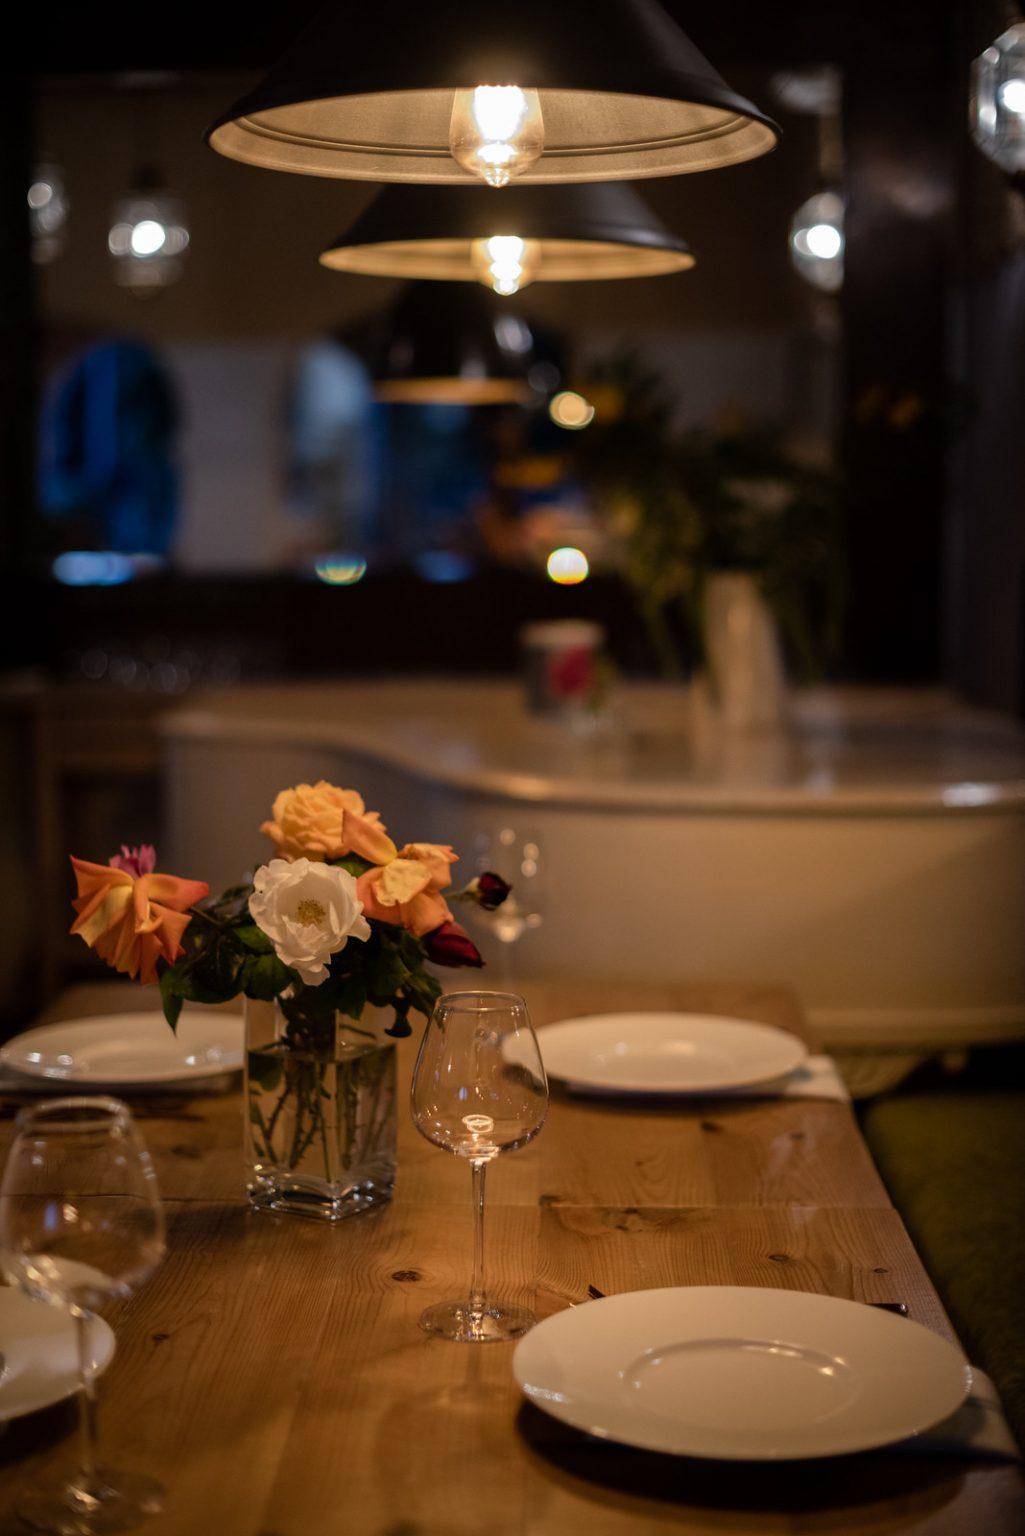 https://www.white-ibiza.com/wp-content/uploads/2020/11/cas-gasi-restaurant-2020-11-1025x1536.jpg